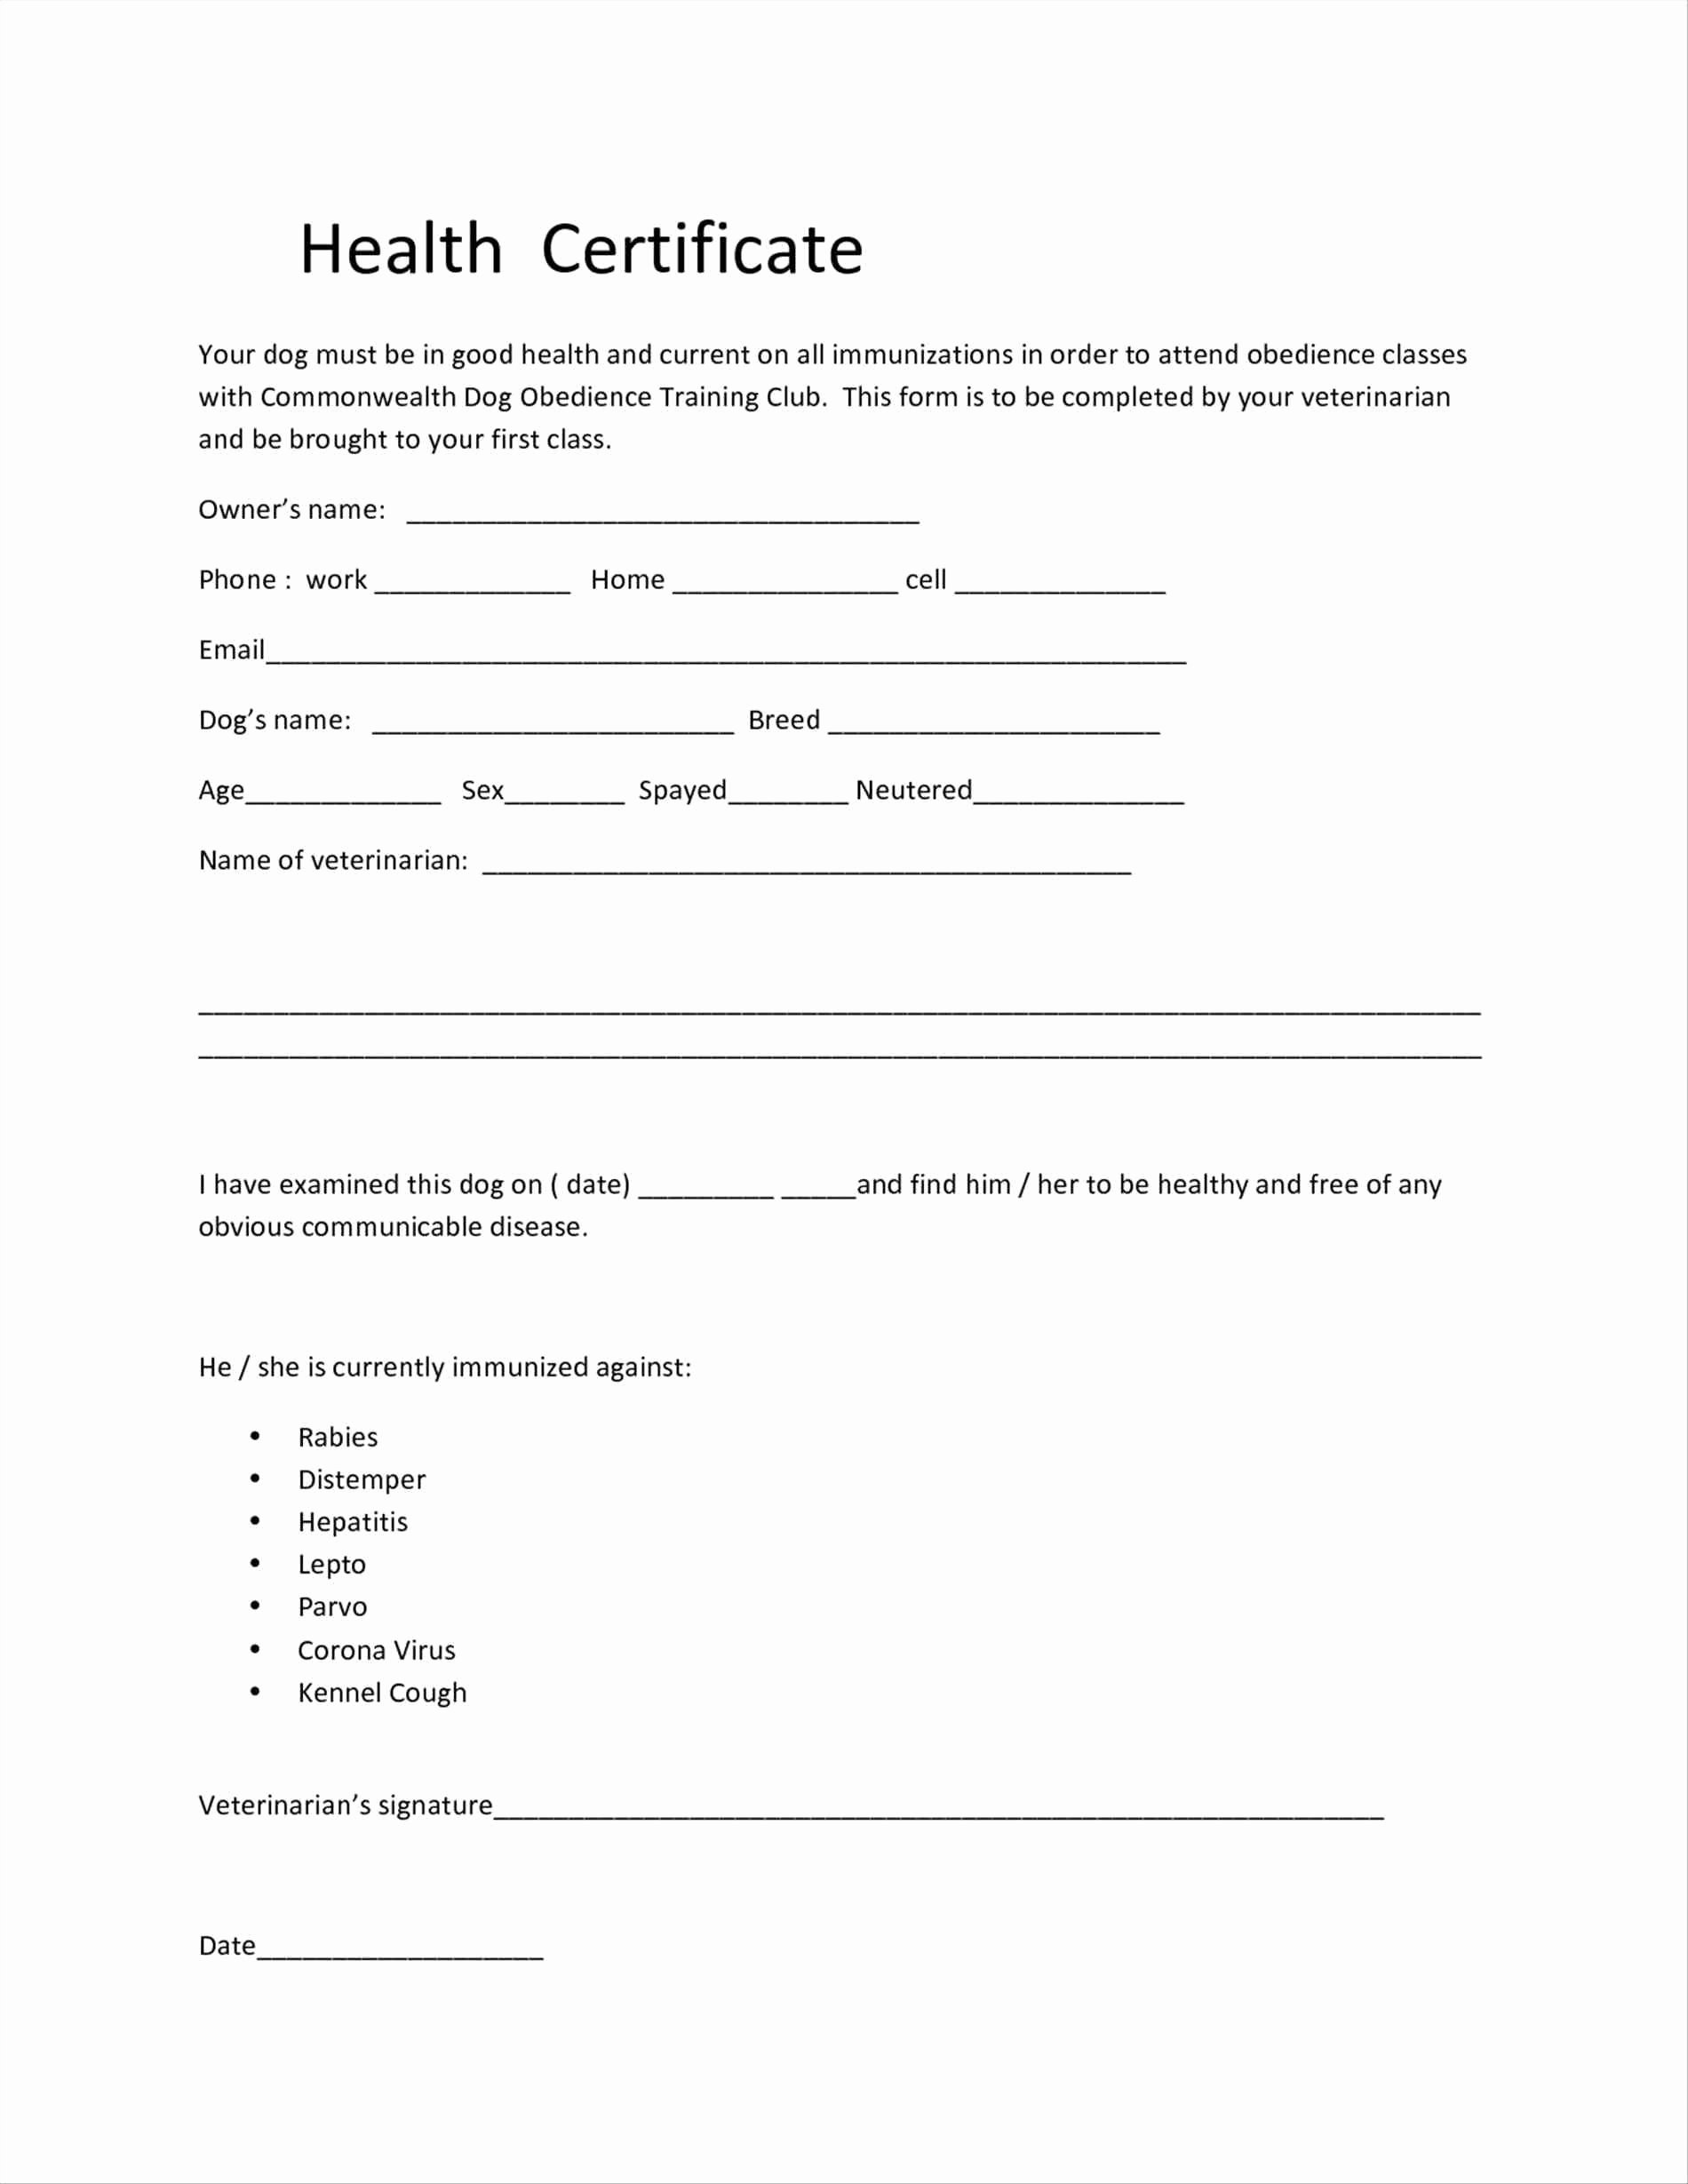 Health Certificate format Kenindle fortzone